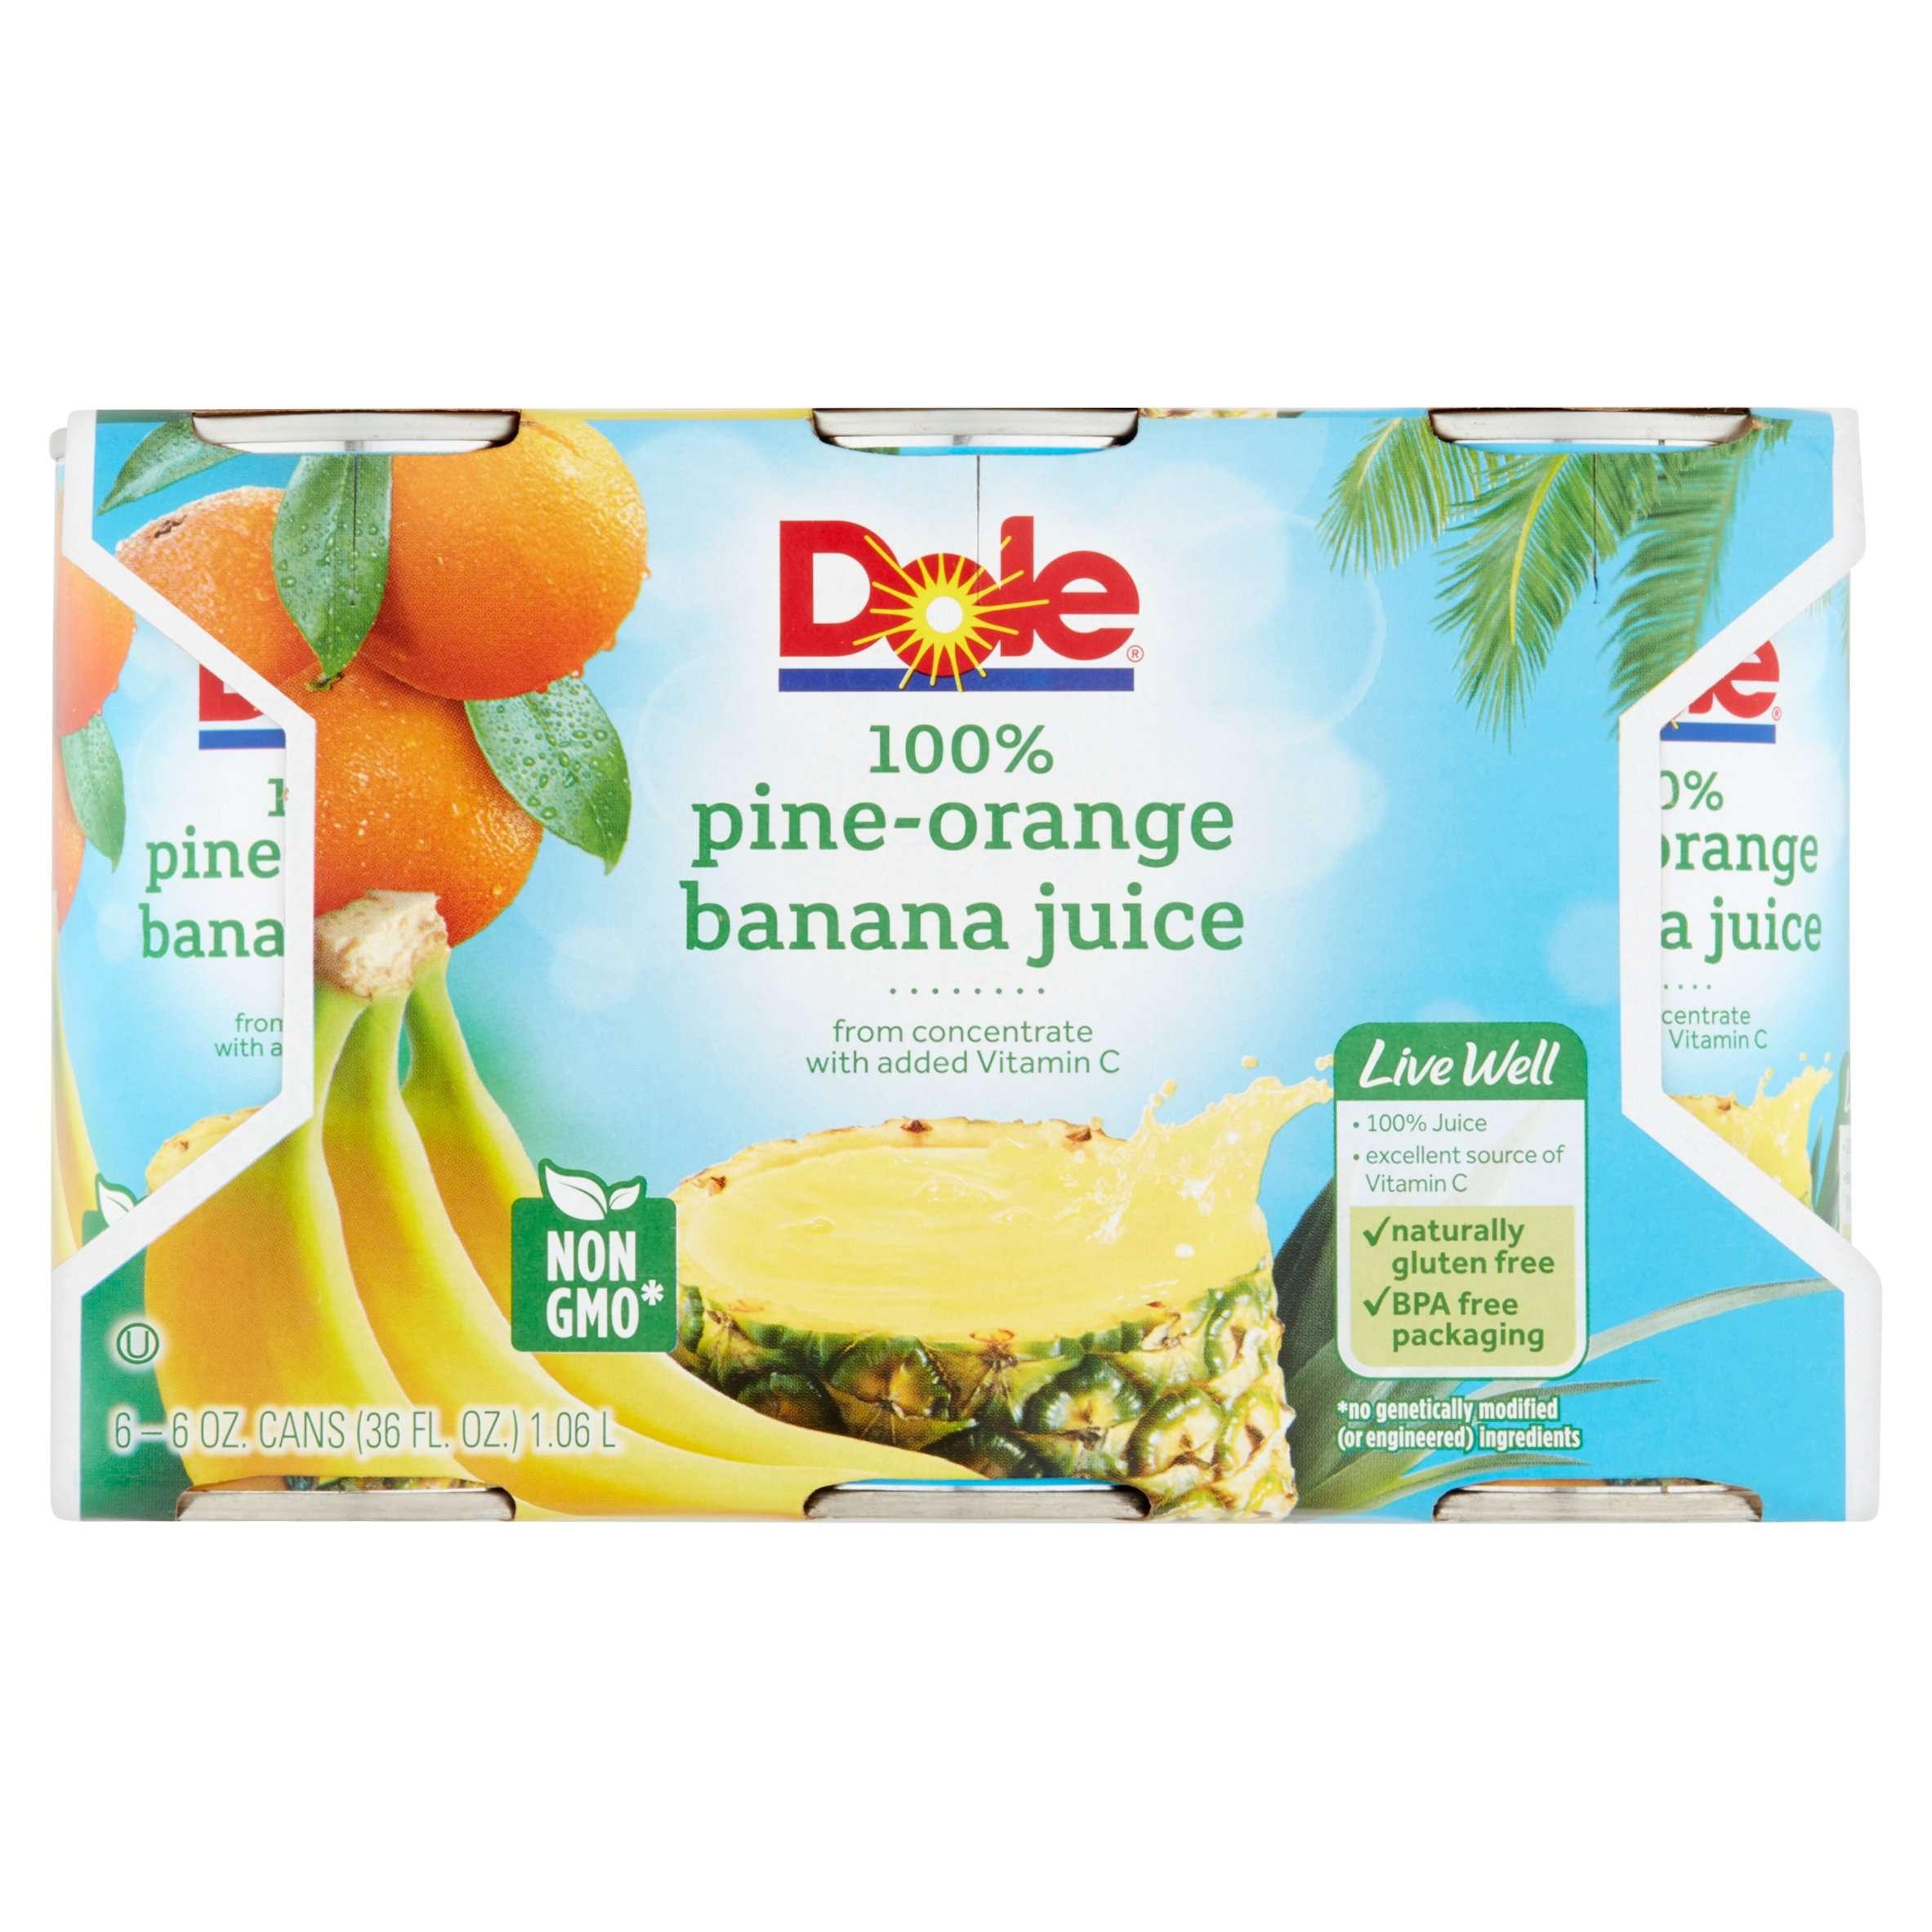 Dole Pine-Orange Banana Juice, 6 fl oz, 6 count by Dole Packaged Foods Co